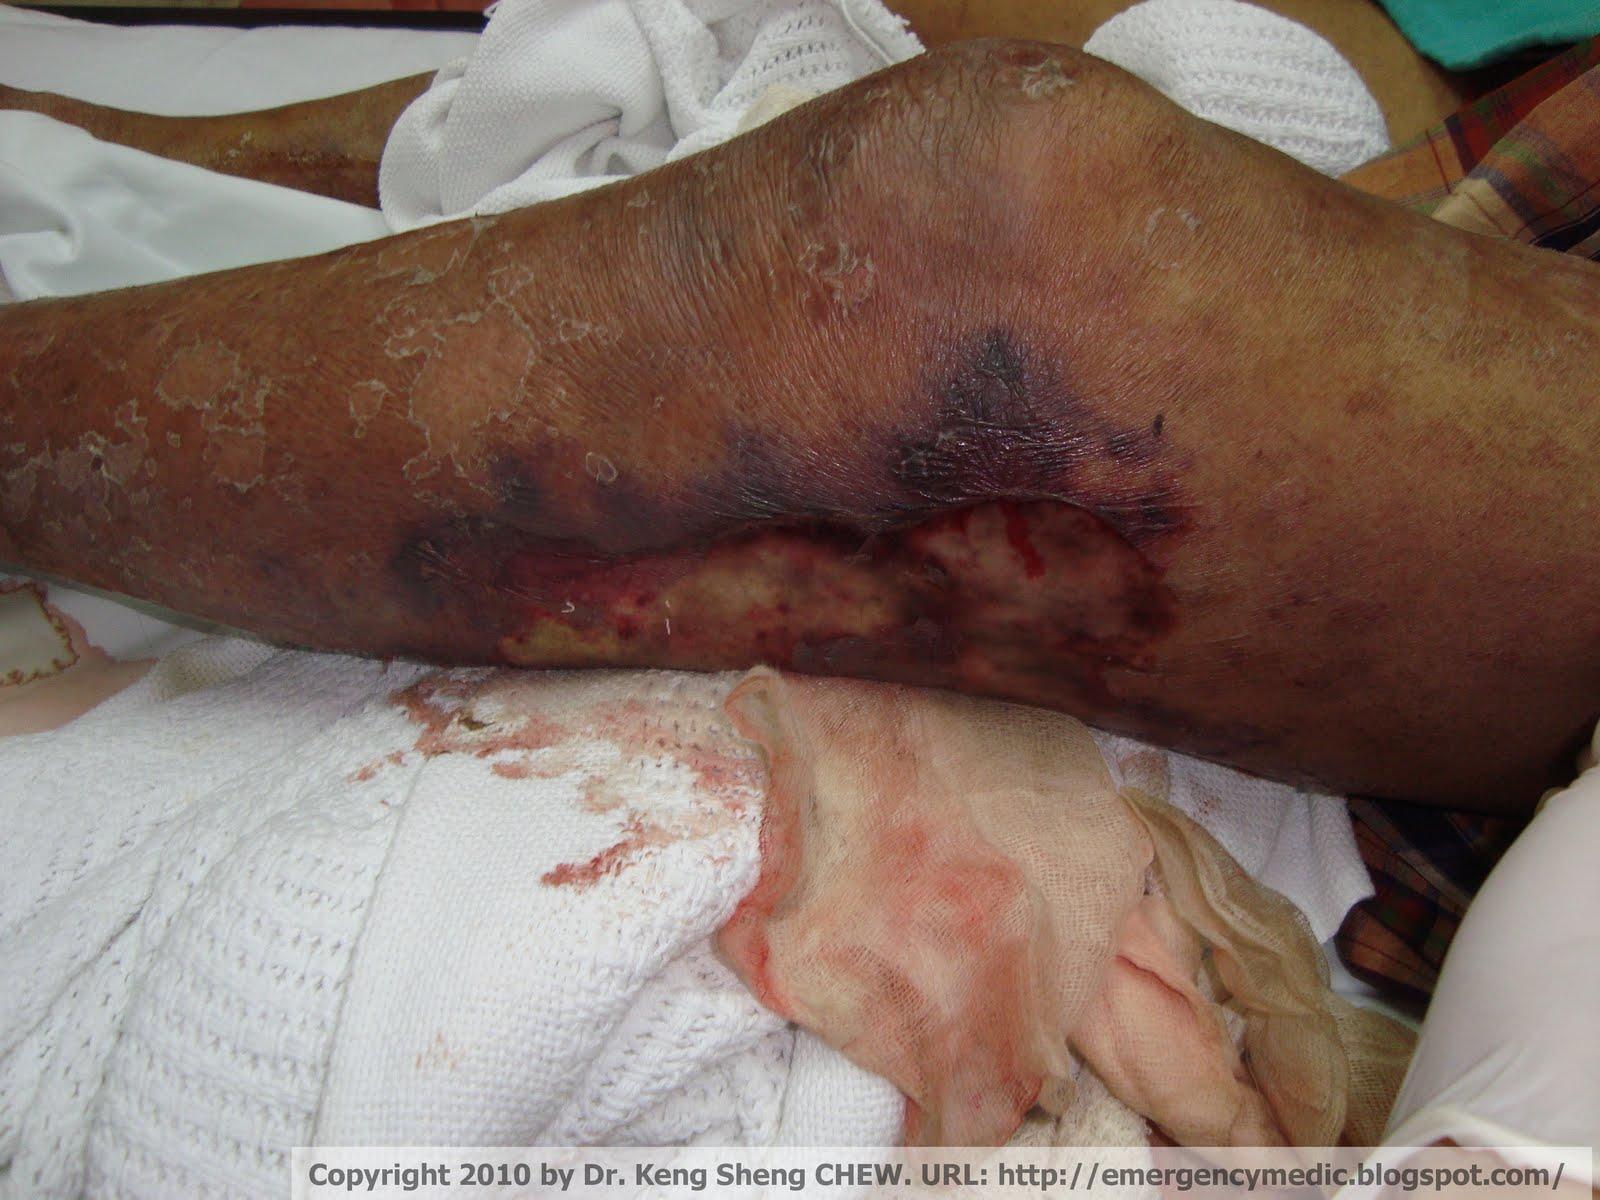 Emergency Medicine Blog: Necrotizing Fasciitis